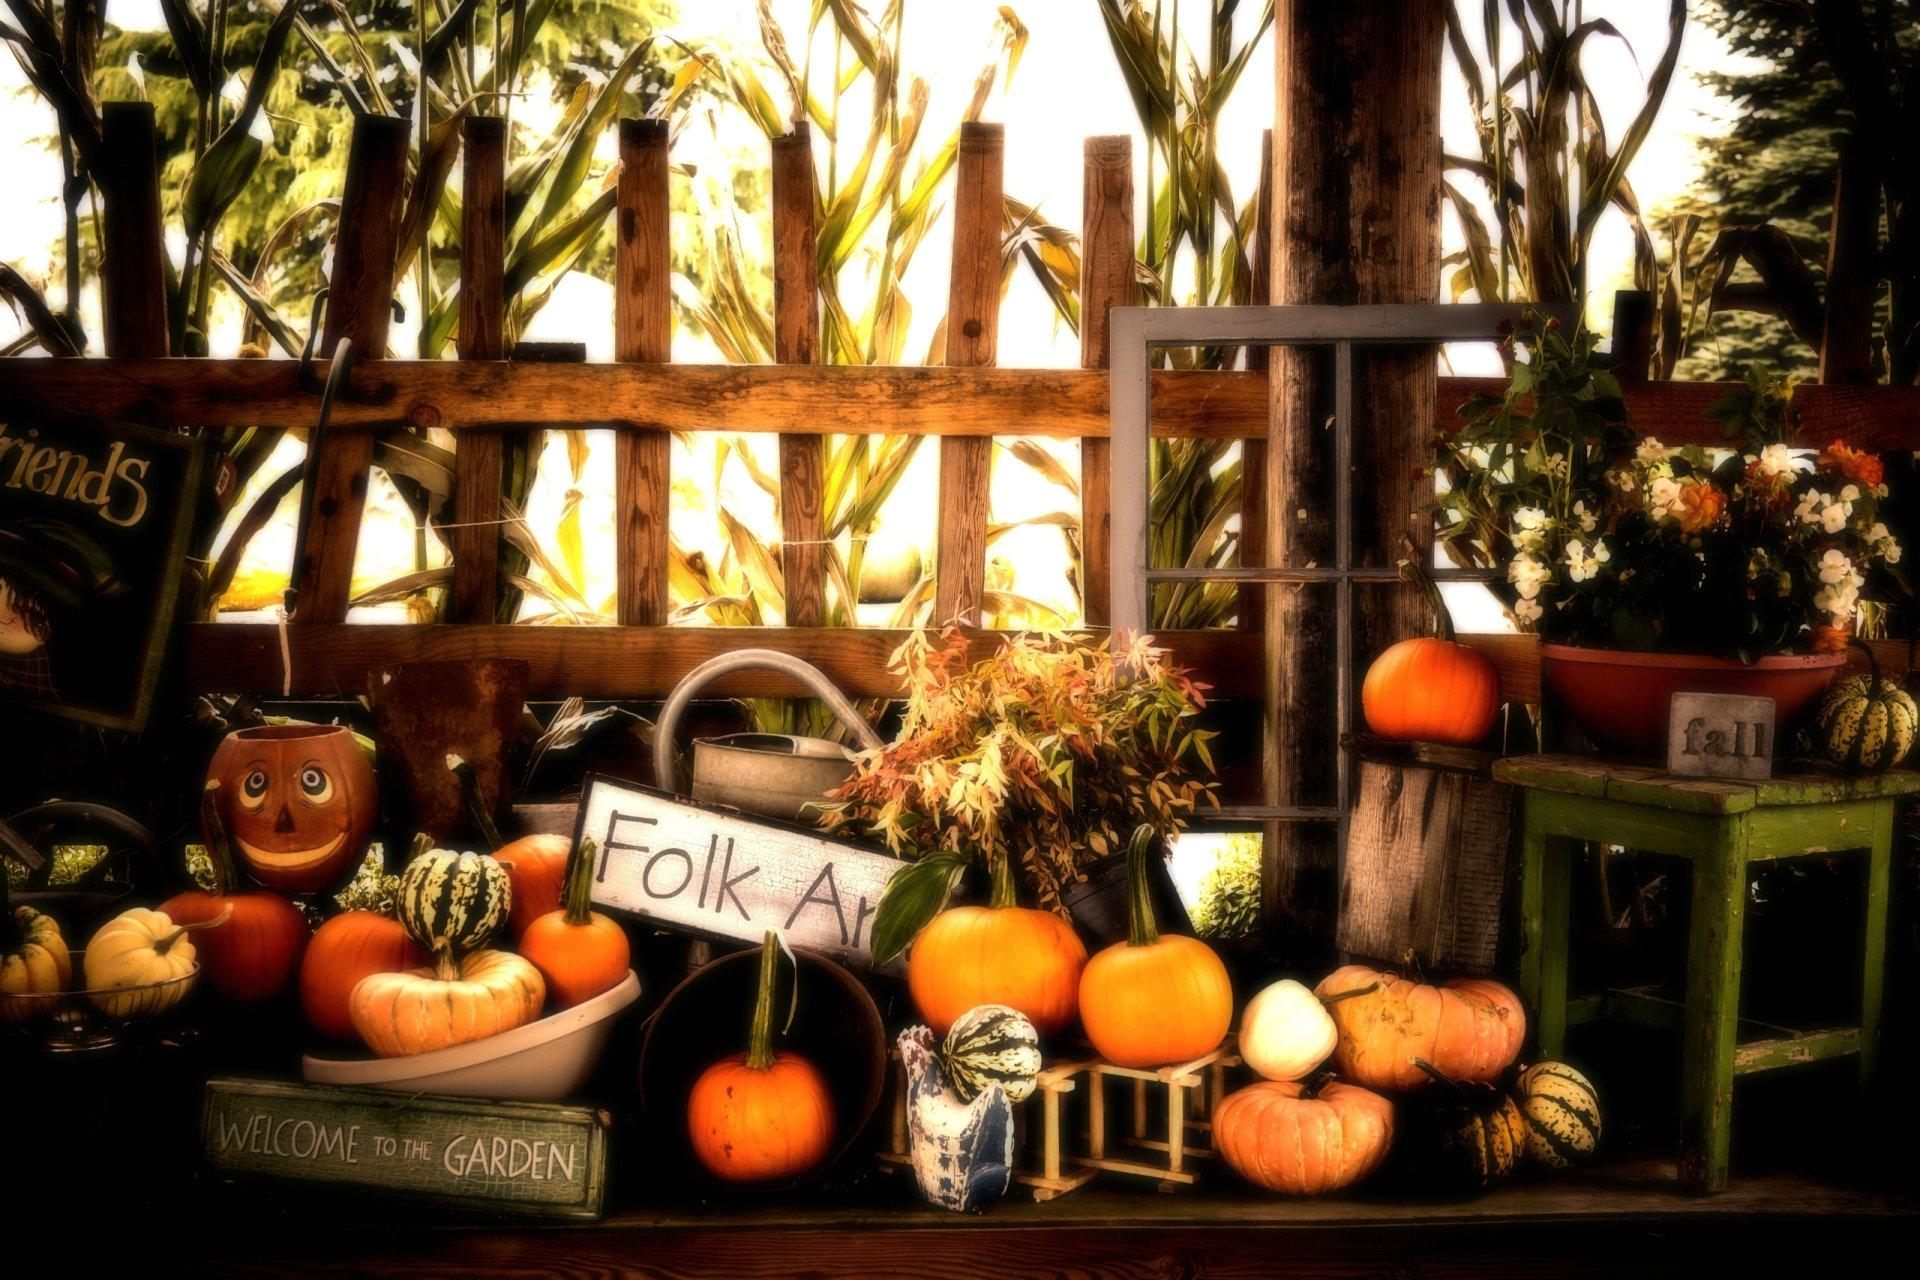 Halloween hd wallpaper background image 2560x1707 id - Pumpkin wallpaper fall ...